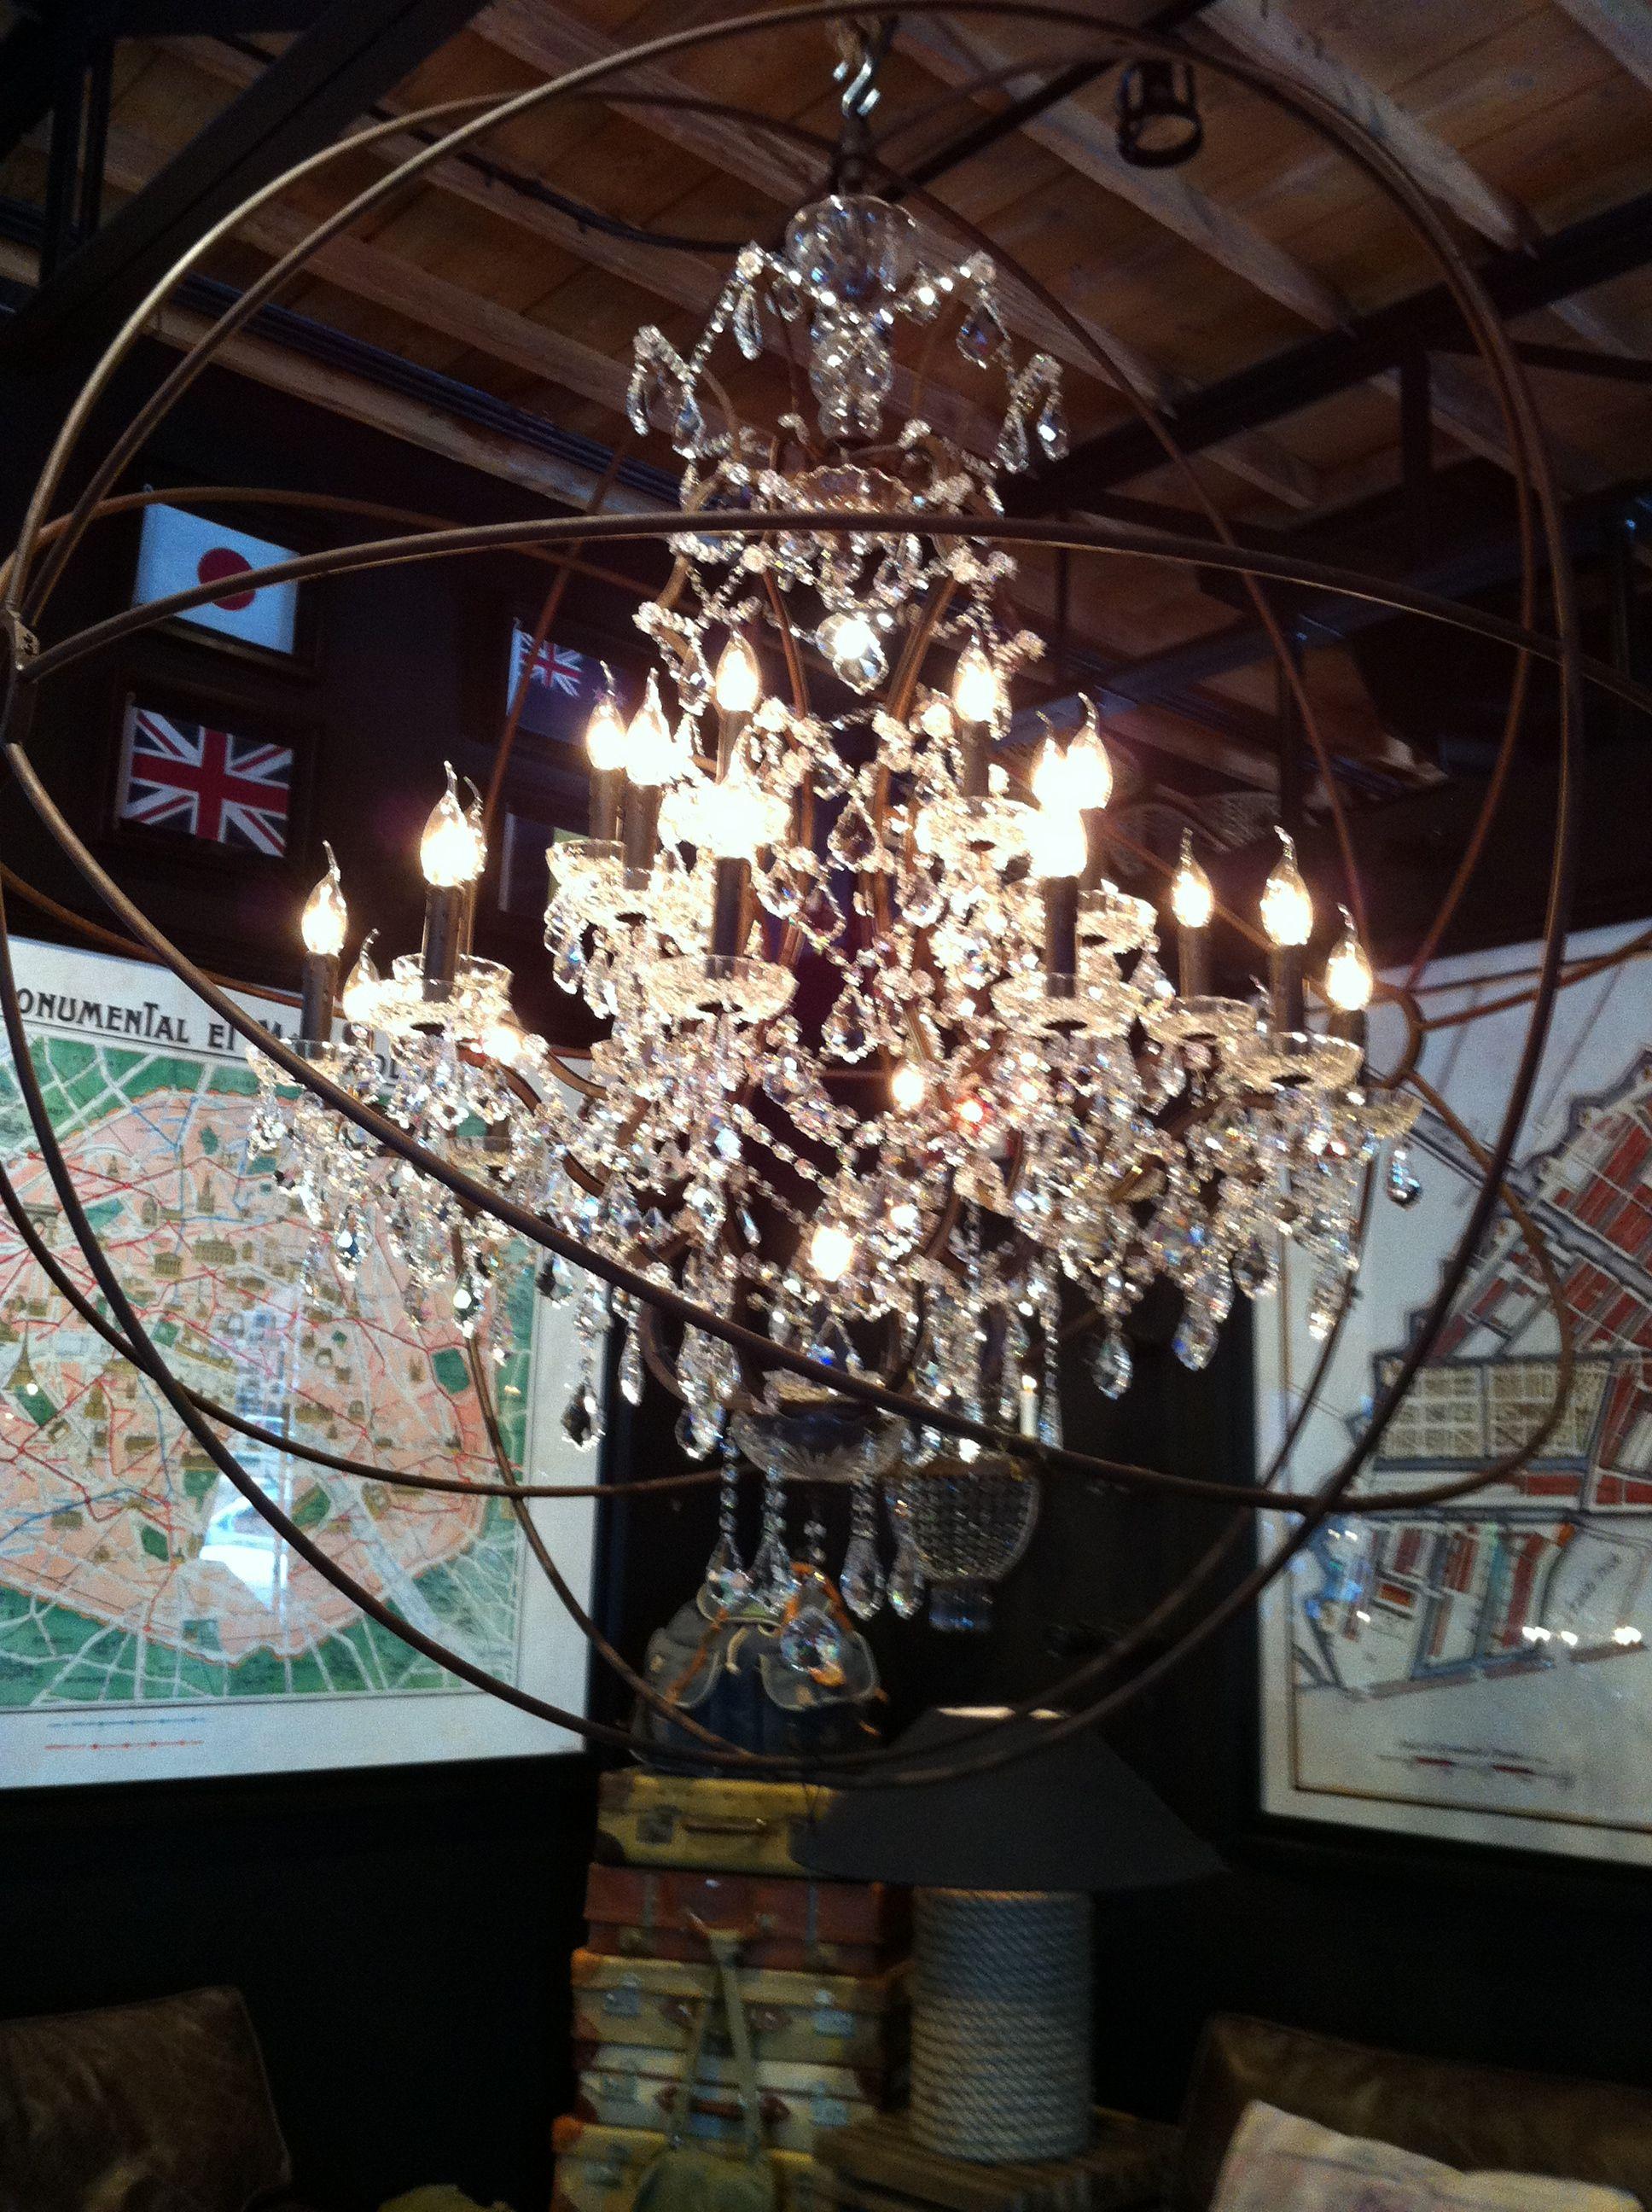 Timothy Oulton Chandelier Pinterest Chandeliers  # Muebles Gayro Cadiz